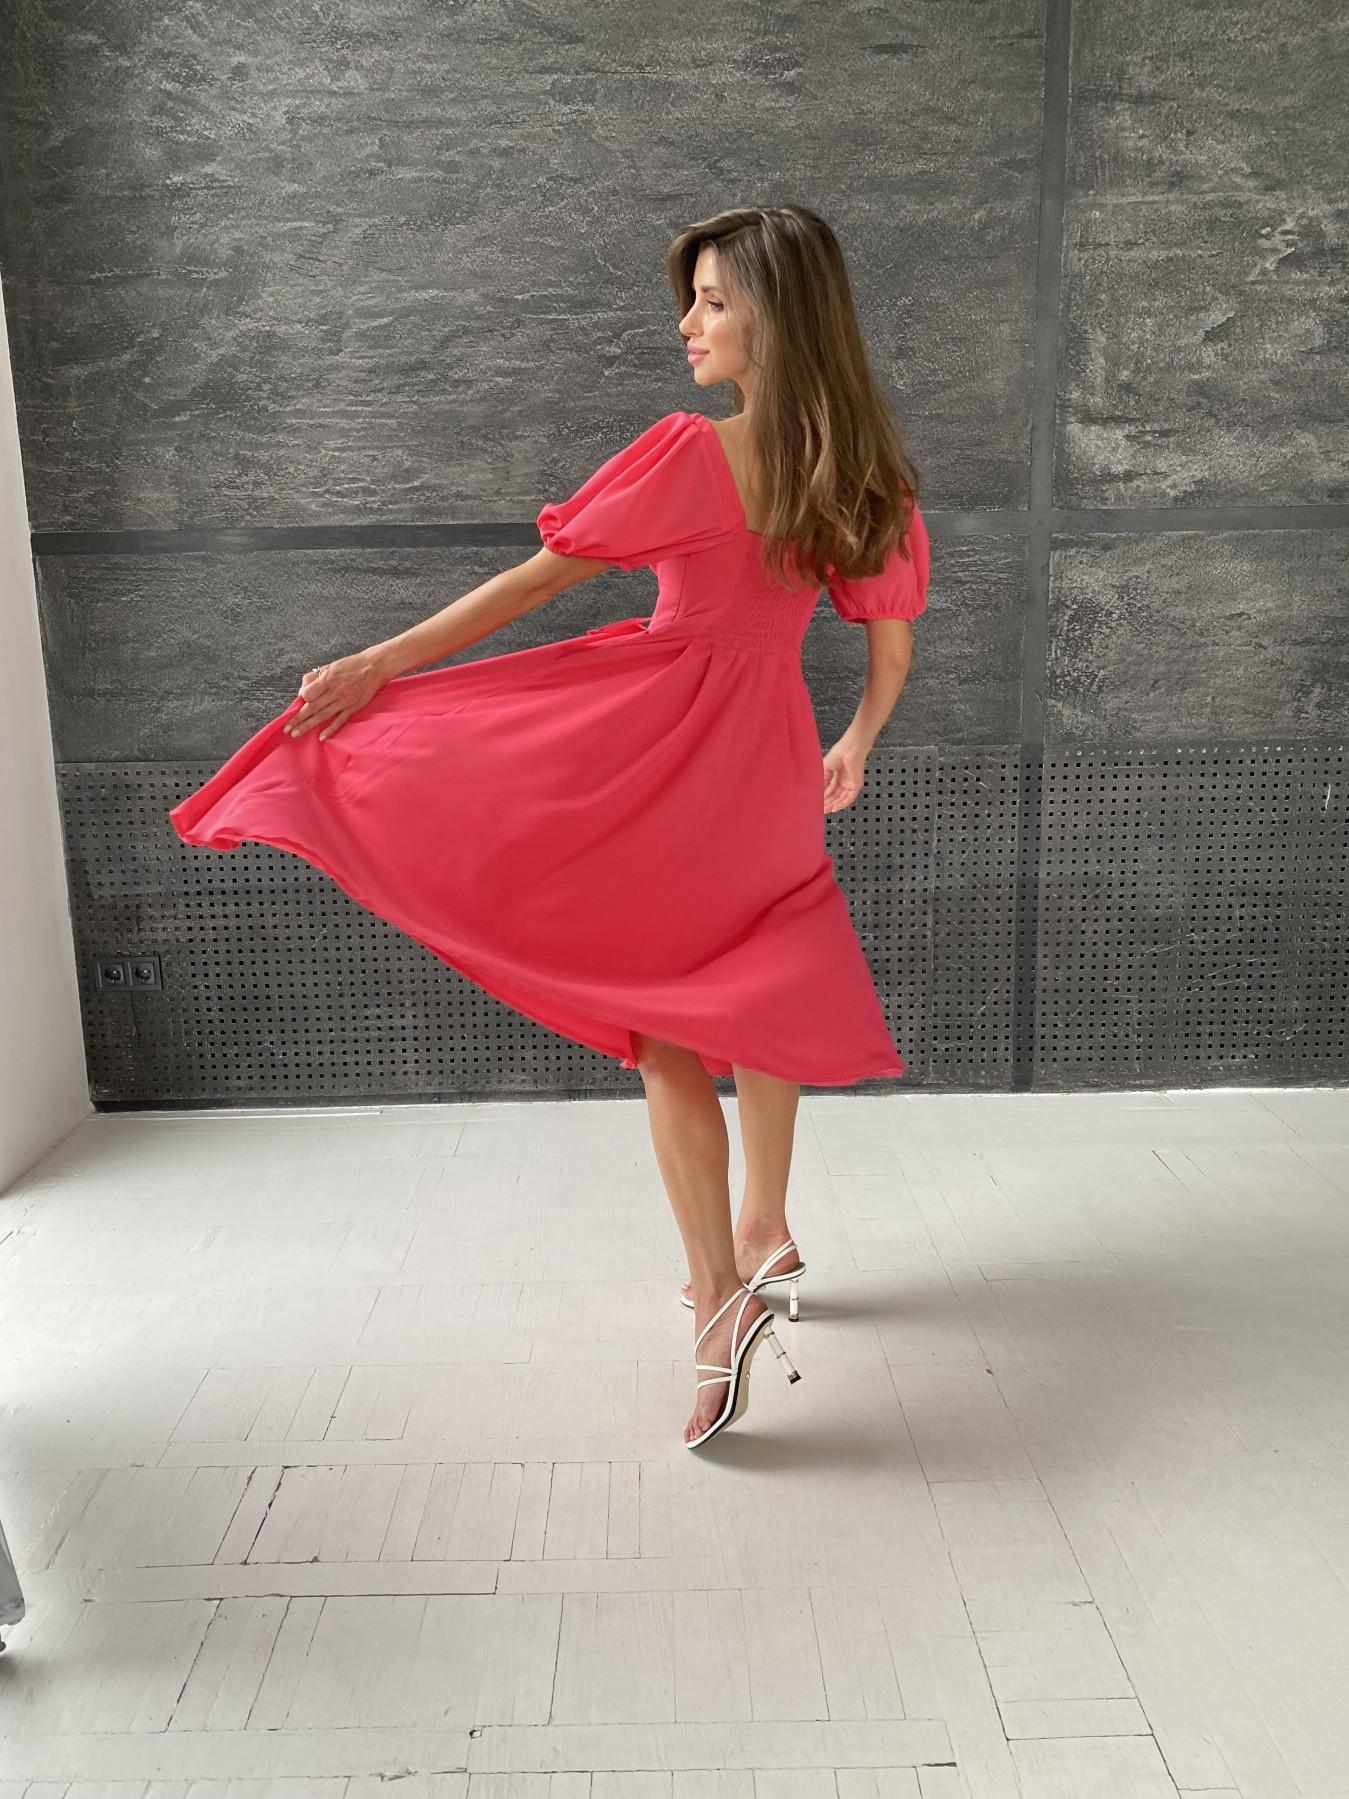 Кисес Миди платье из шифона креп 11443 АРТ. 48314 Цвет: Коралл - фото 3, интернет магазин tm-modus.ru